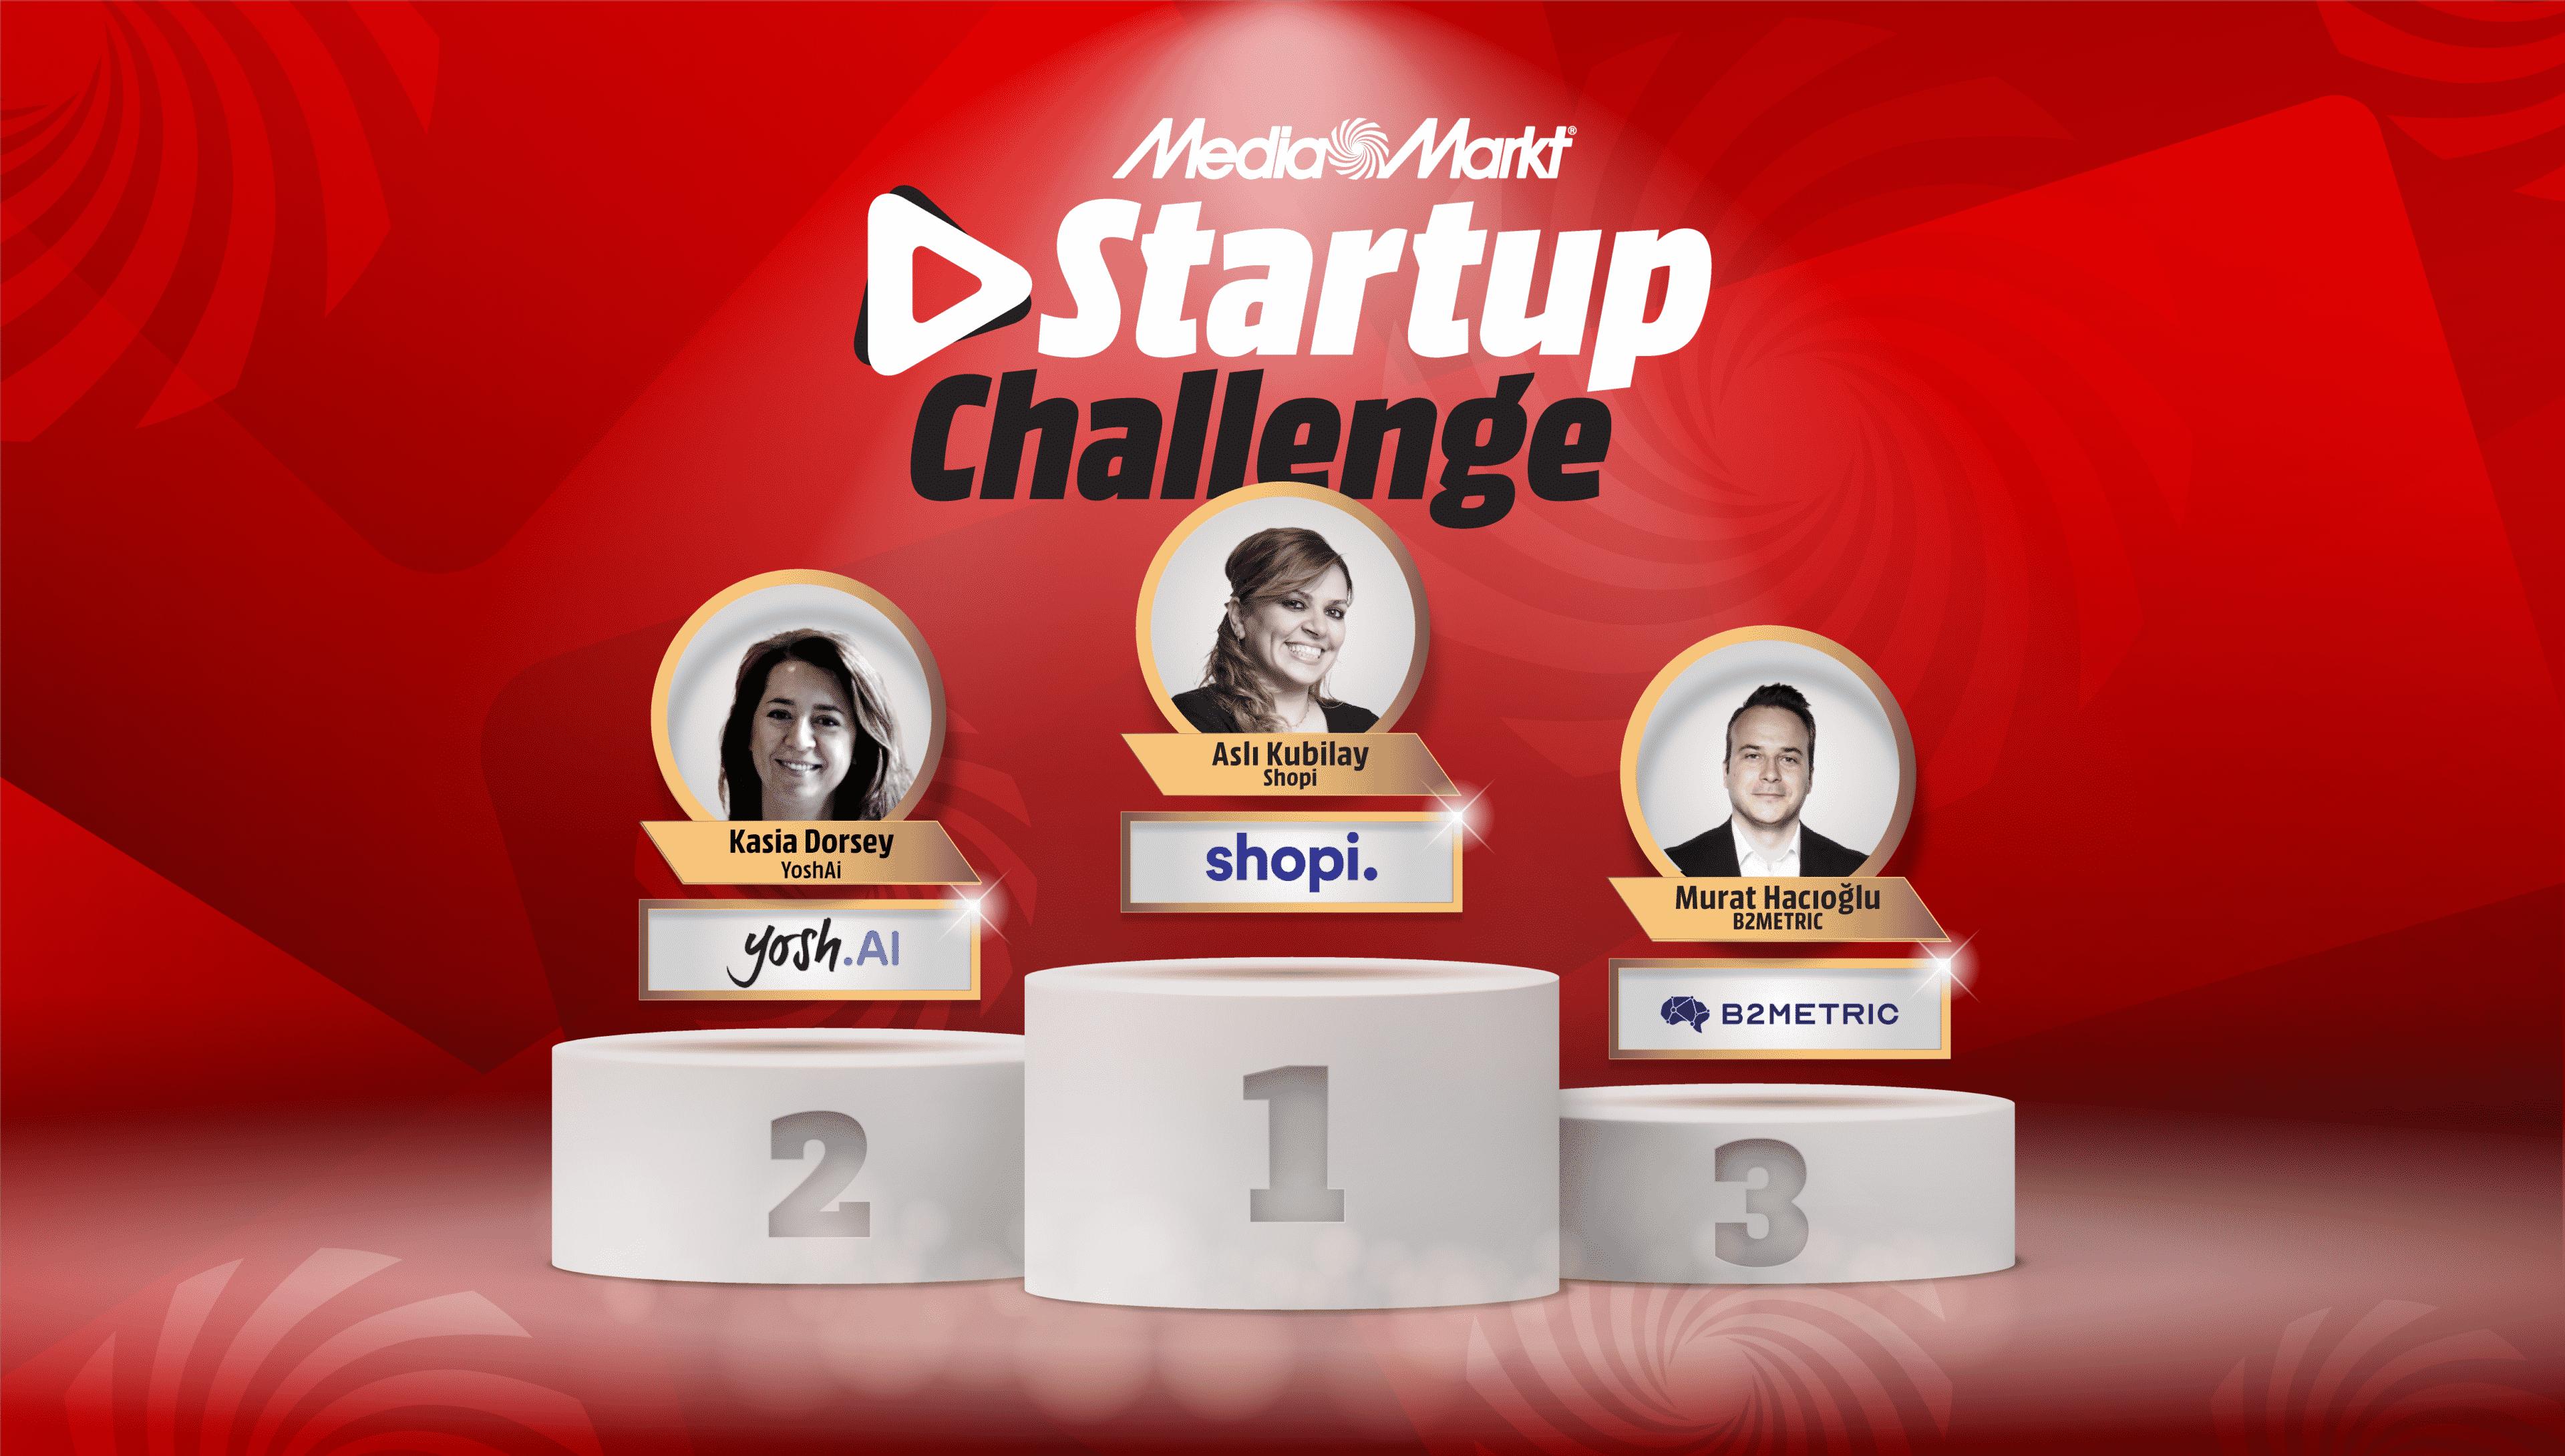 mediamarkt startup challenge 20 kazananları